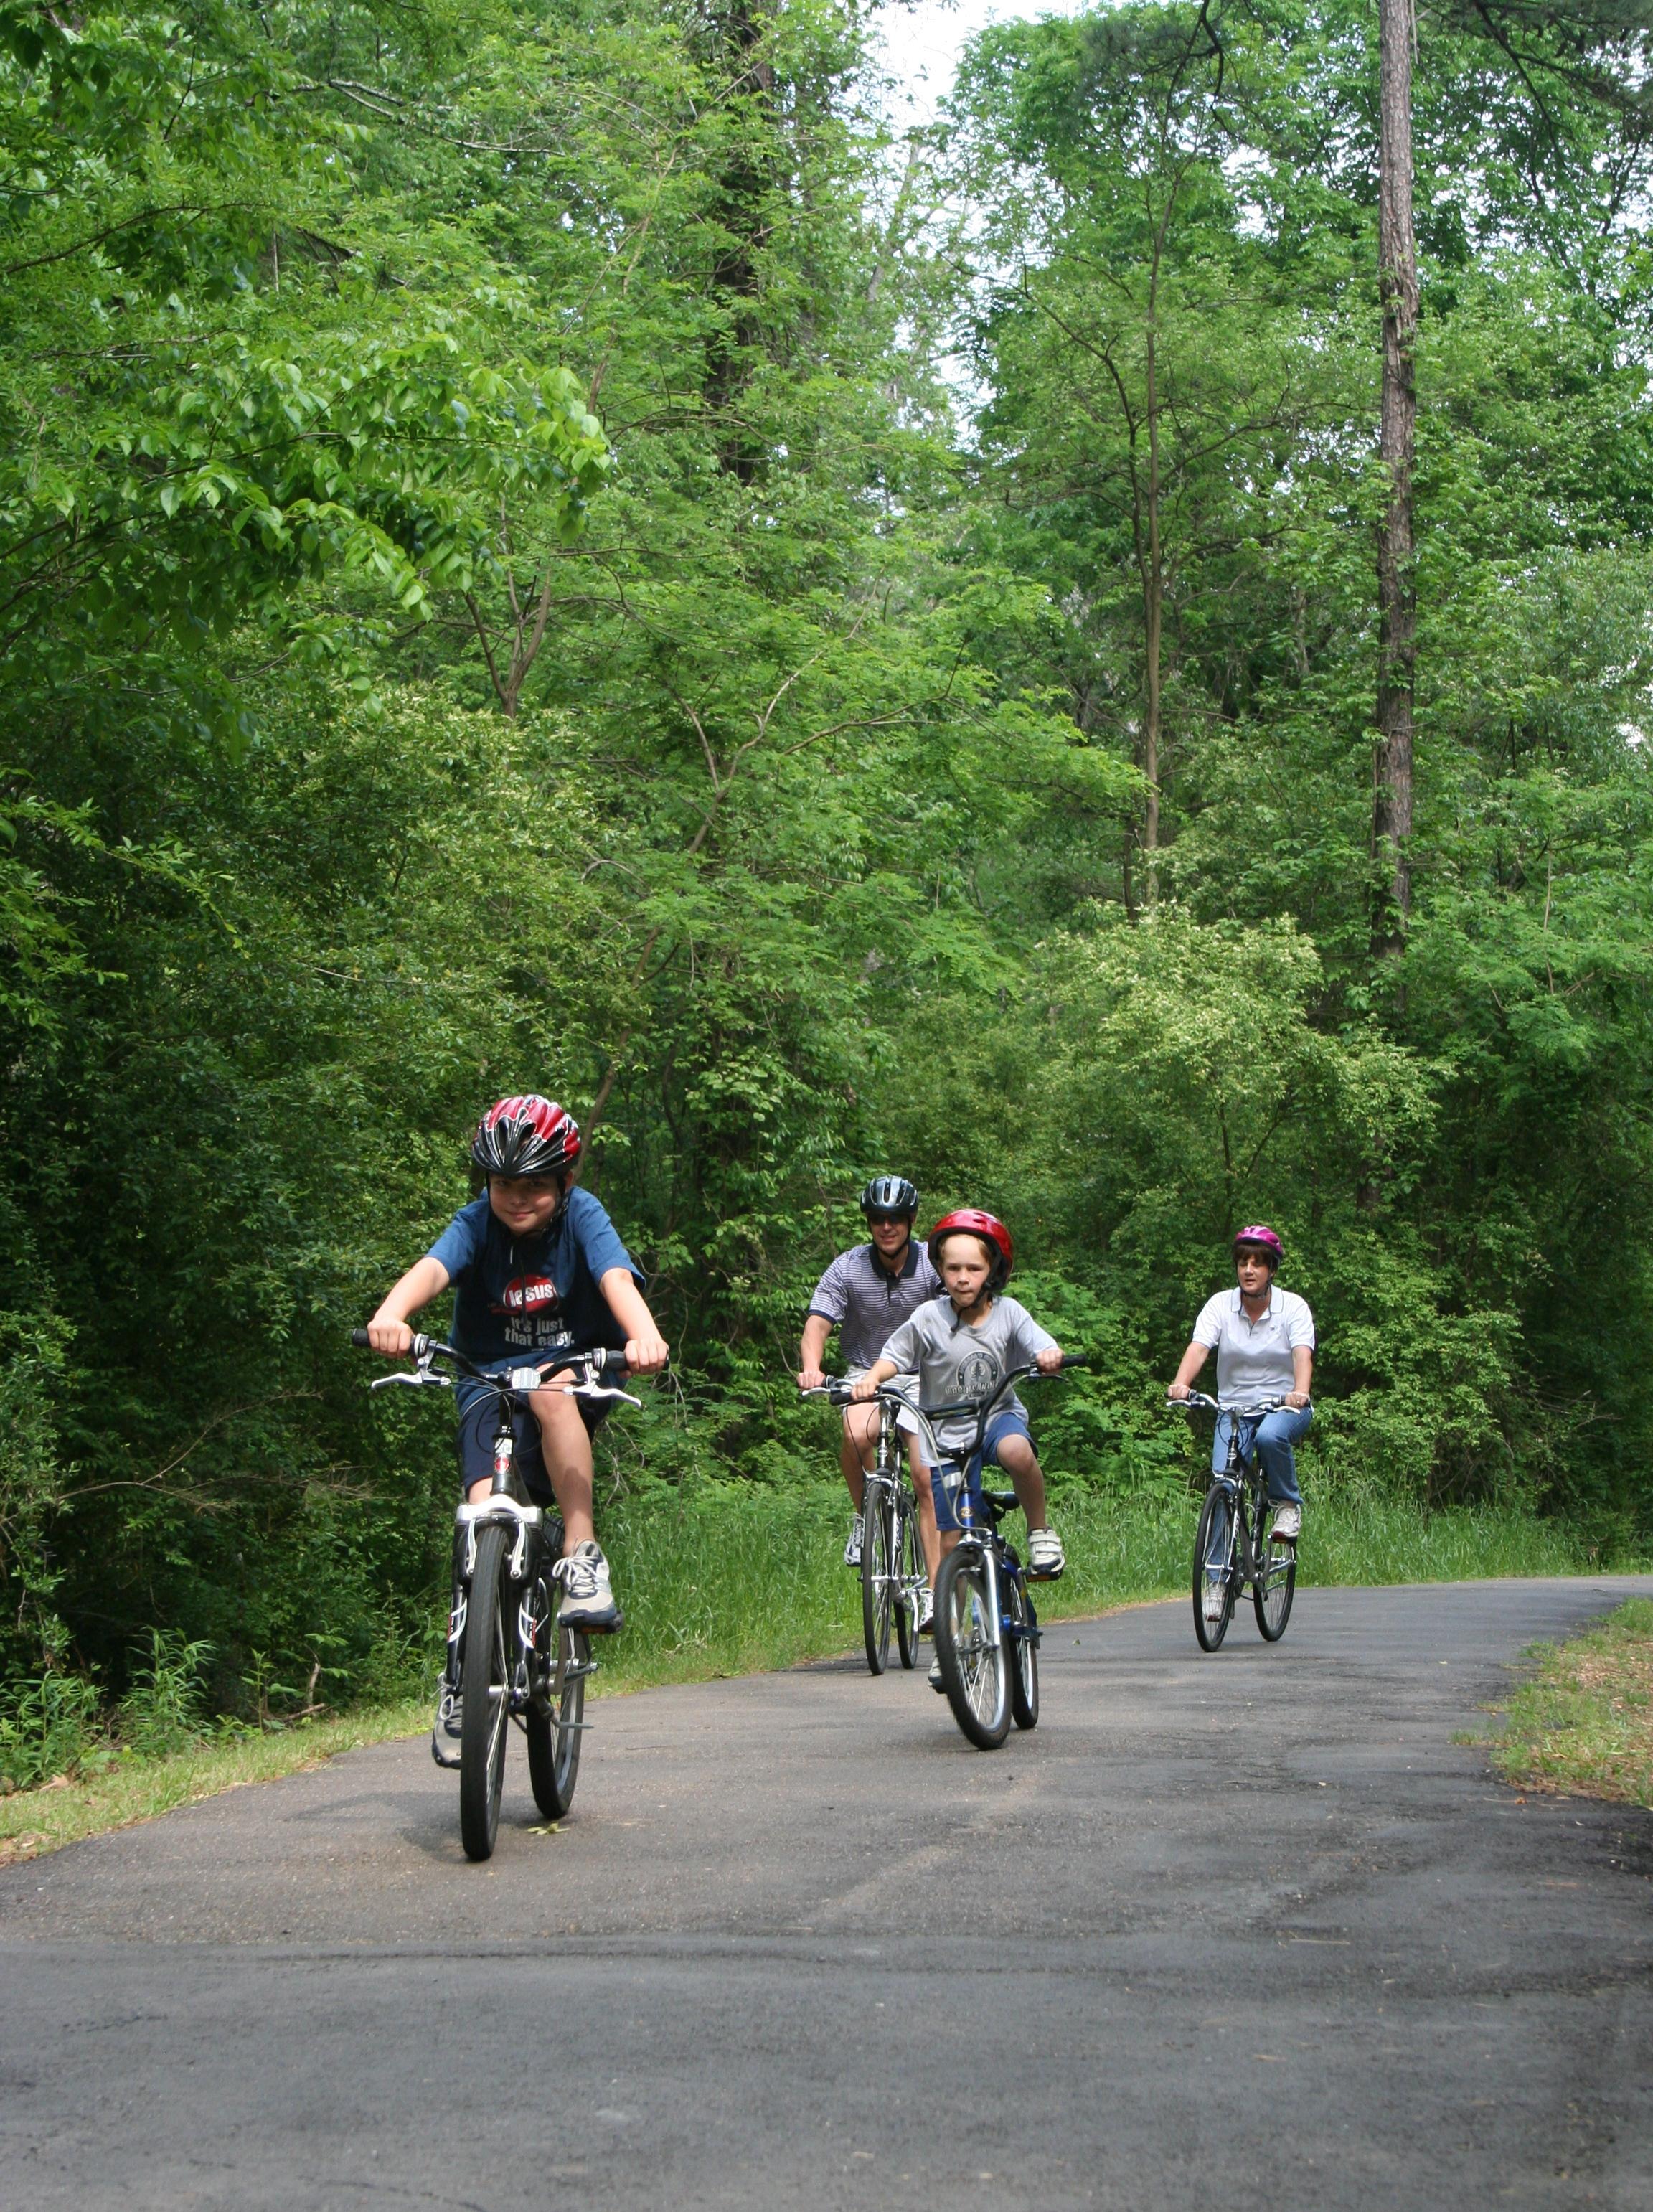 Multi-Use Path in Ridgeland, MS